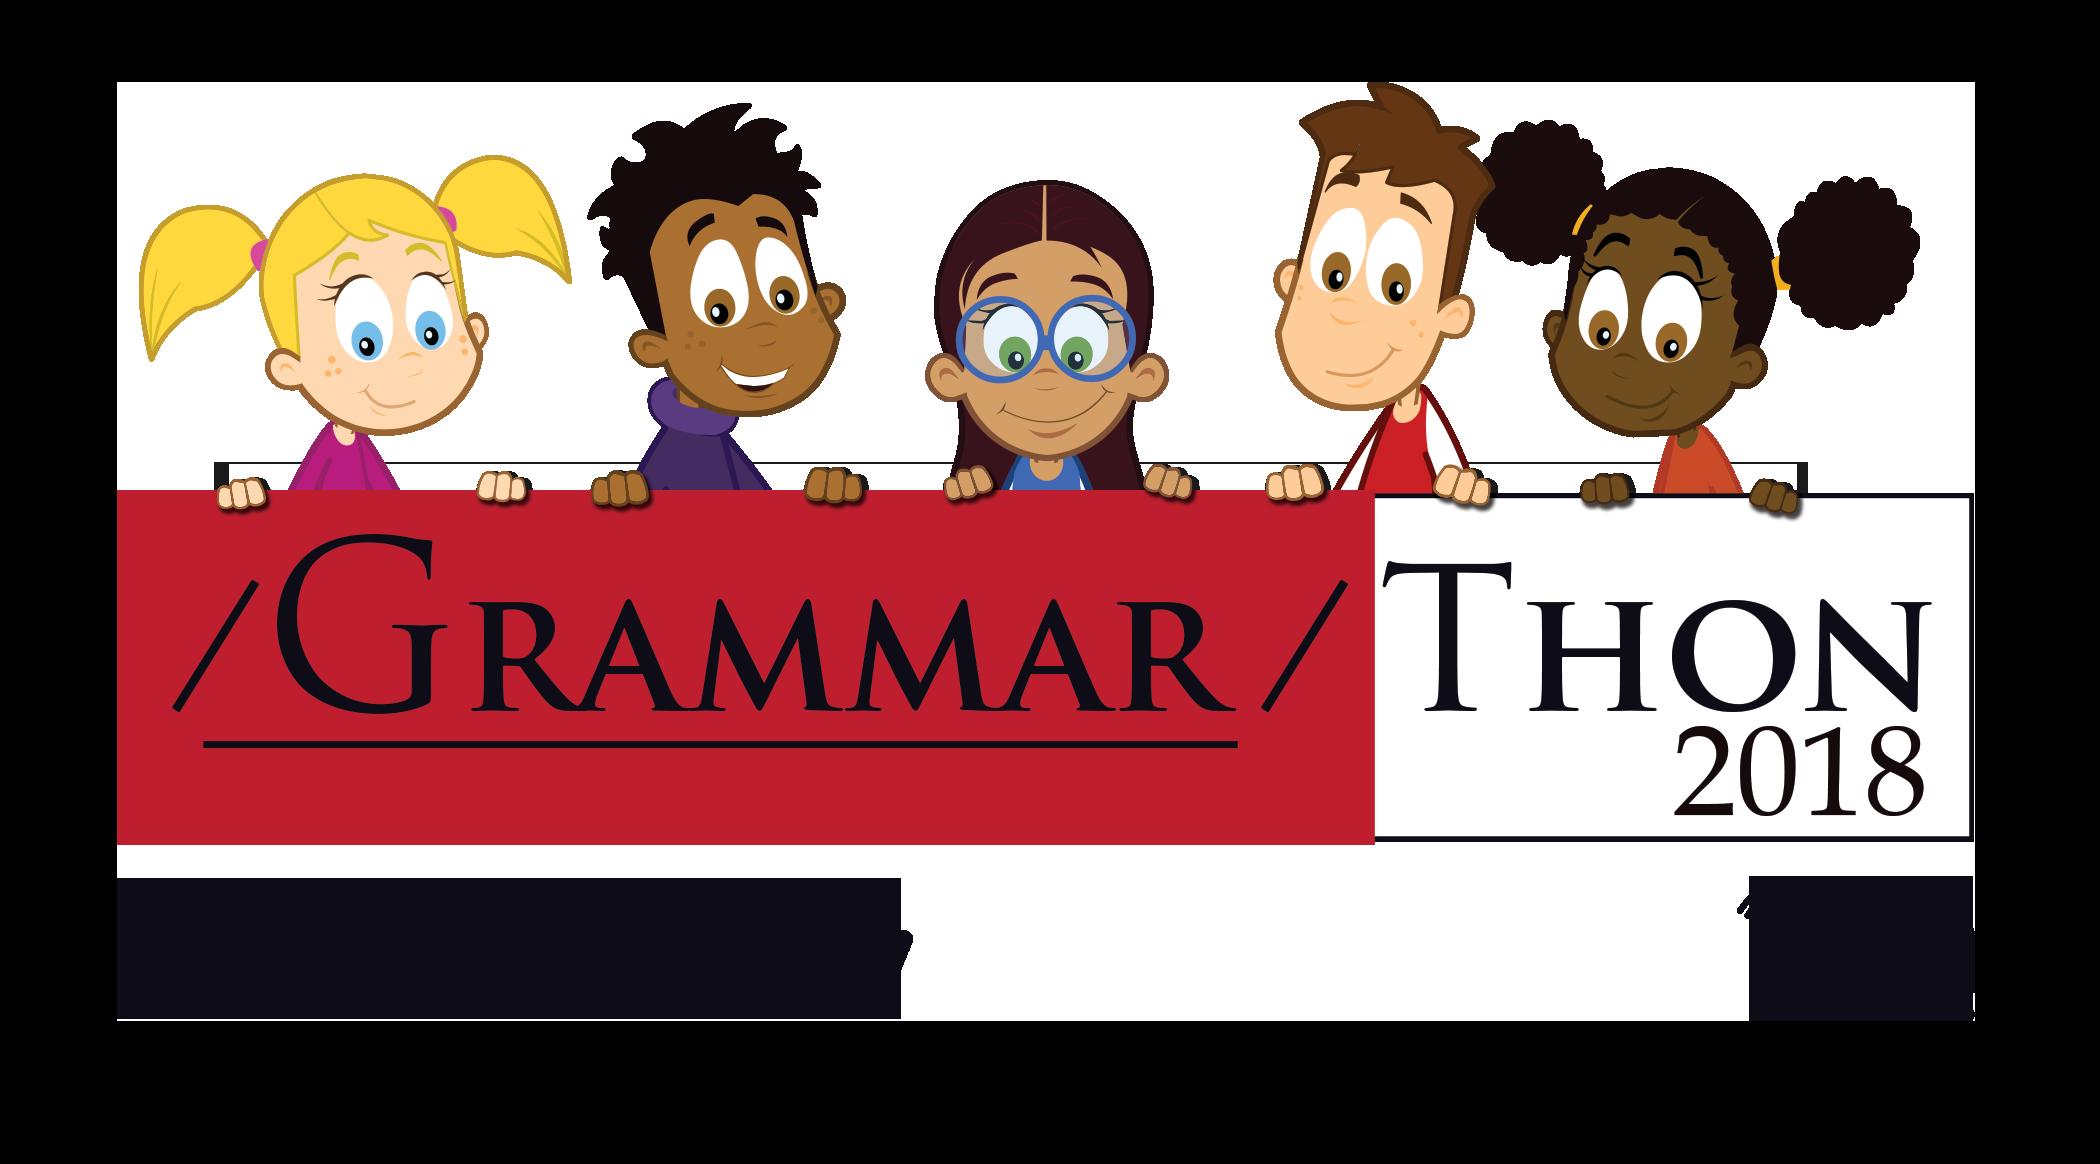 Grammar thon ctnbq org. Raffle clipart basket goods